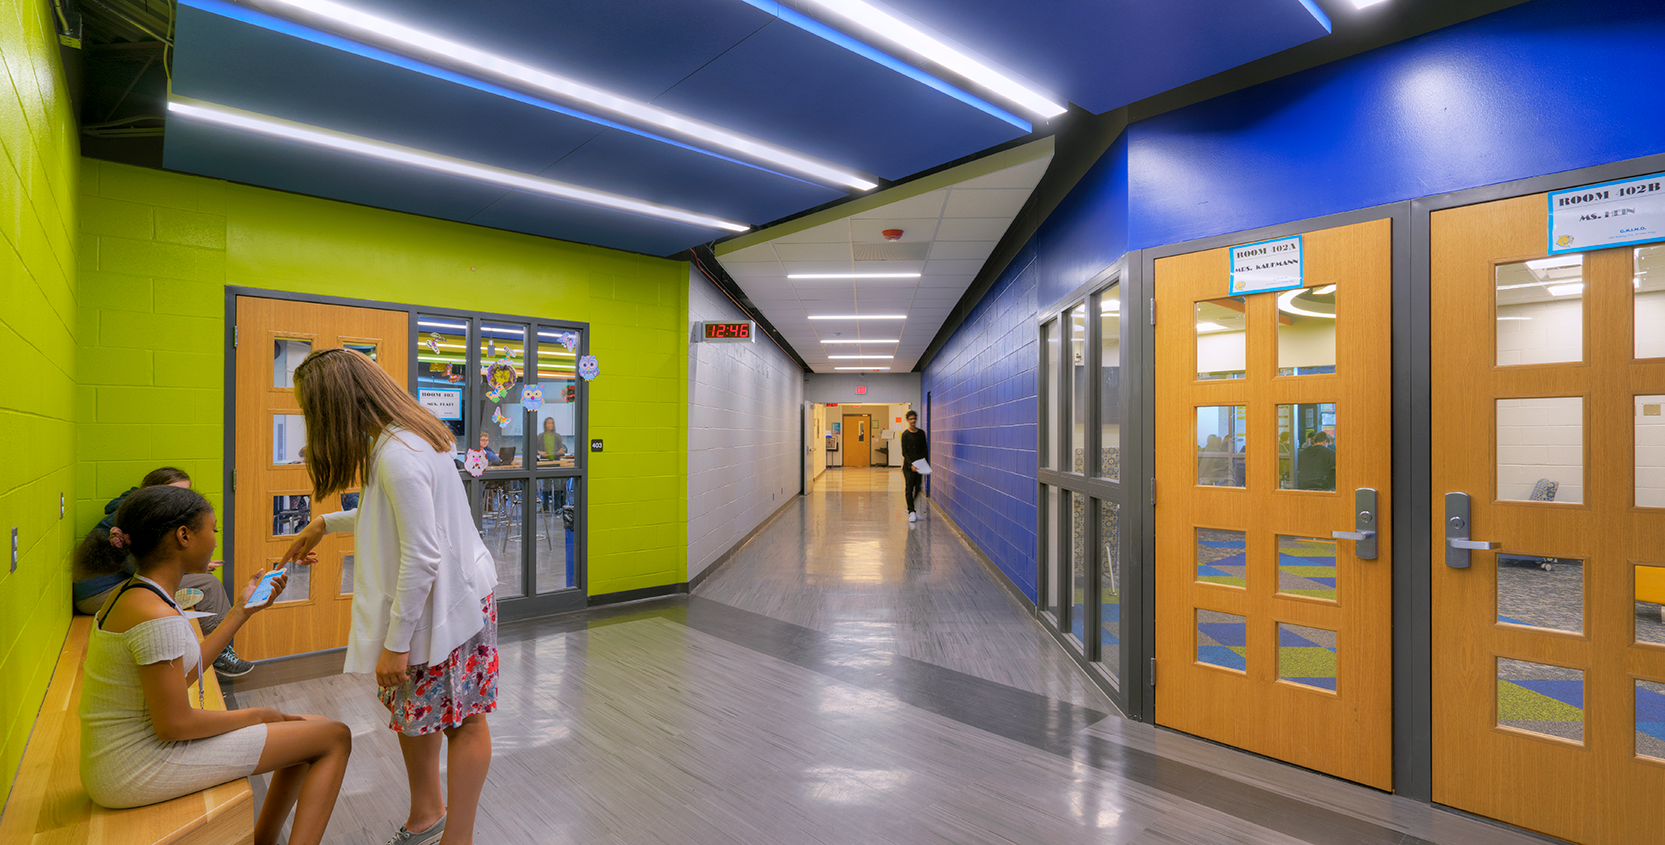 Port-Huron-Northern-High-School-Renovation-Corridor-1665x845